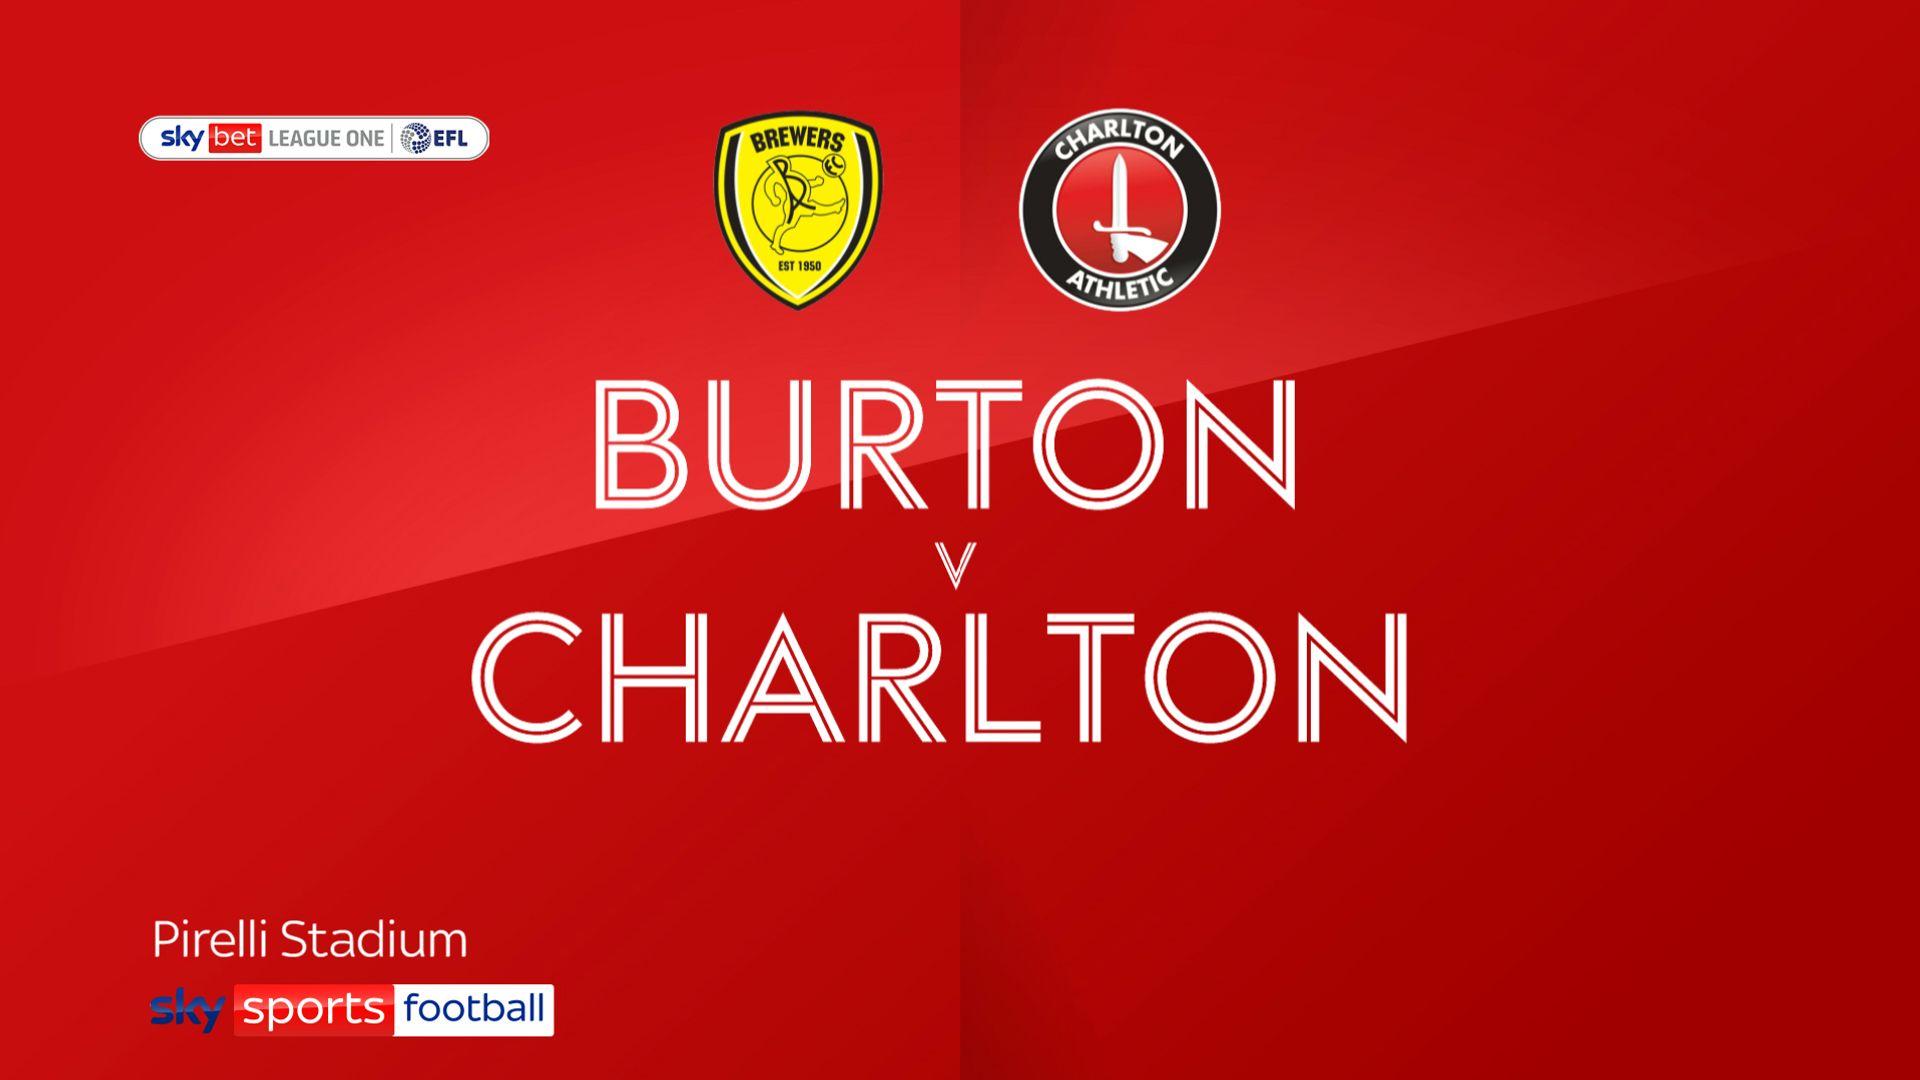 Burton defy form book to stun Charlton